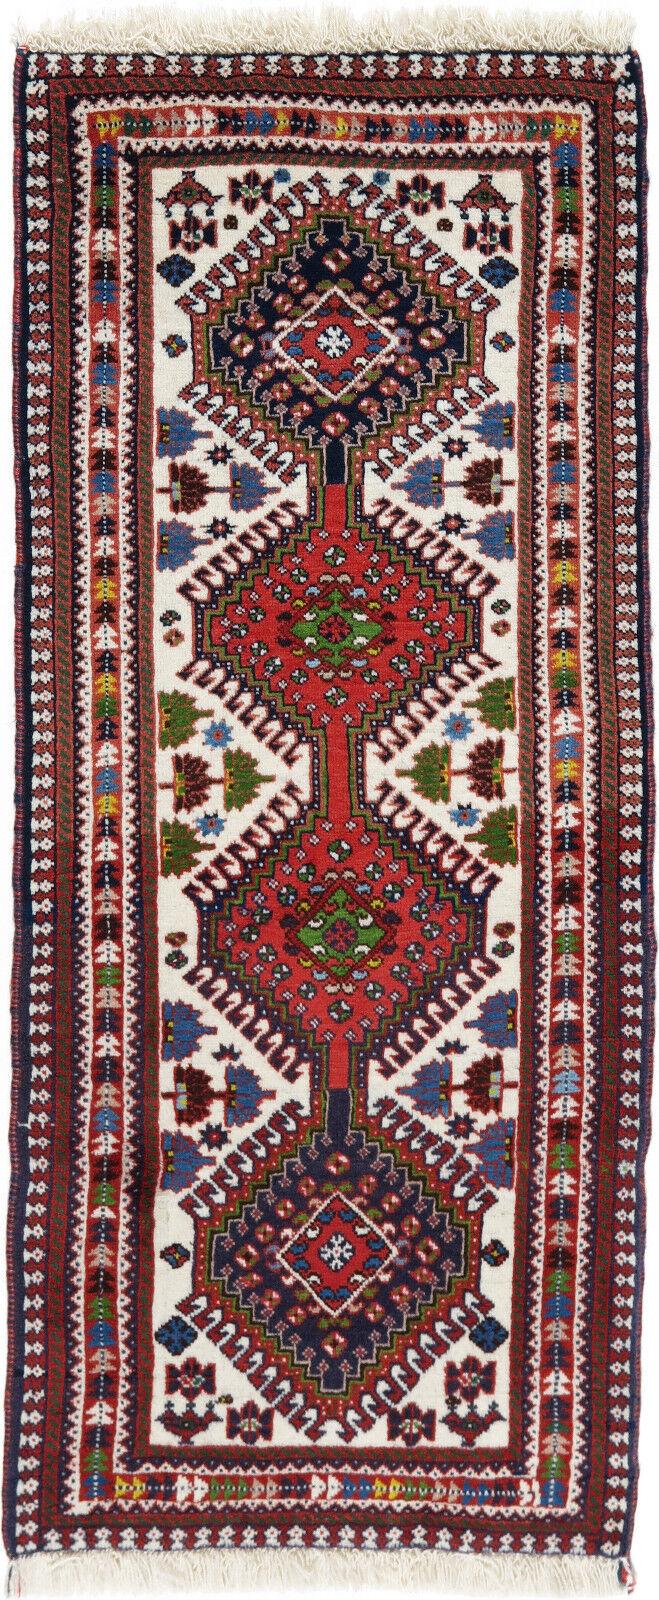 Yalameh alfombra Orient alfombra Rug Carpet tapis tapijt tappeto alfombra tipo de arte